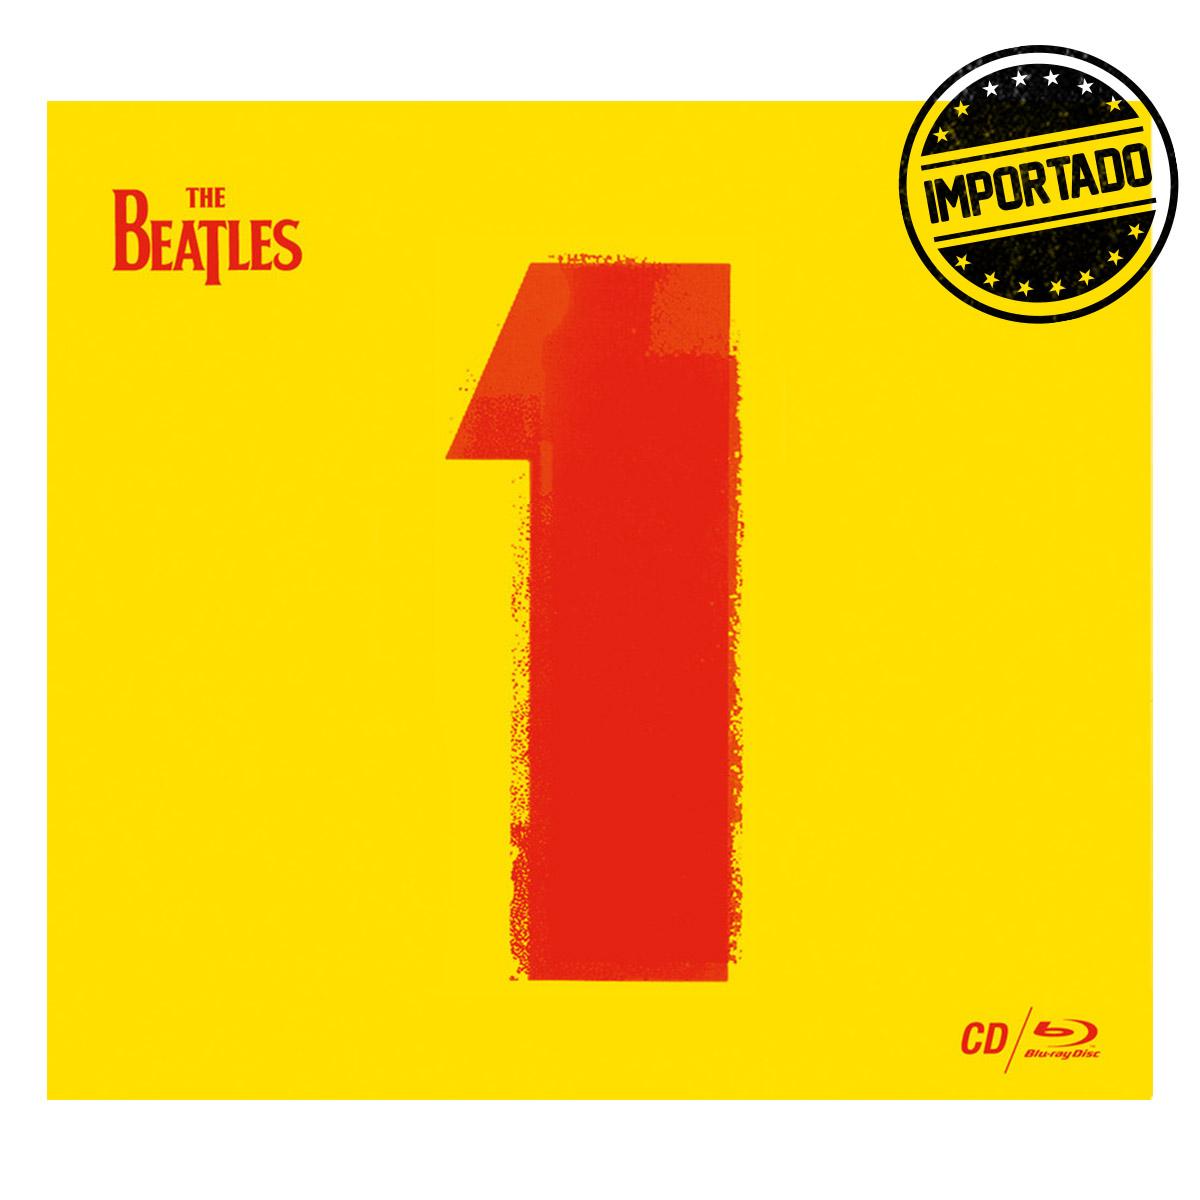 Produto IMPORTADO CD+DVD The Beatles 1 (Ltd. Ed. Gatefold CD digipack)